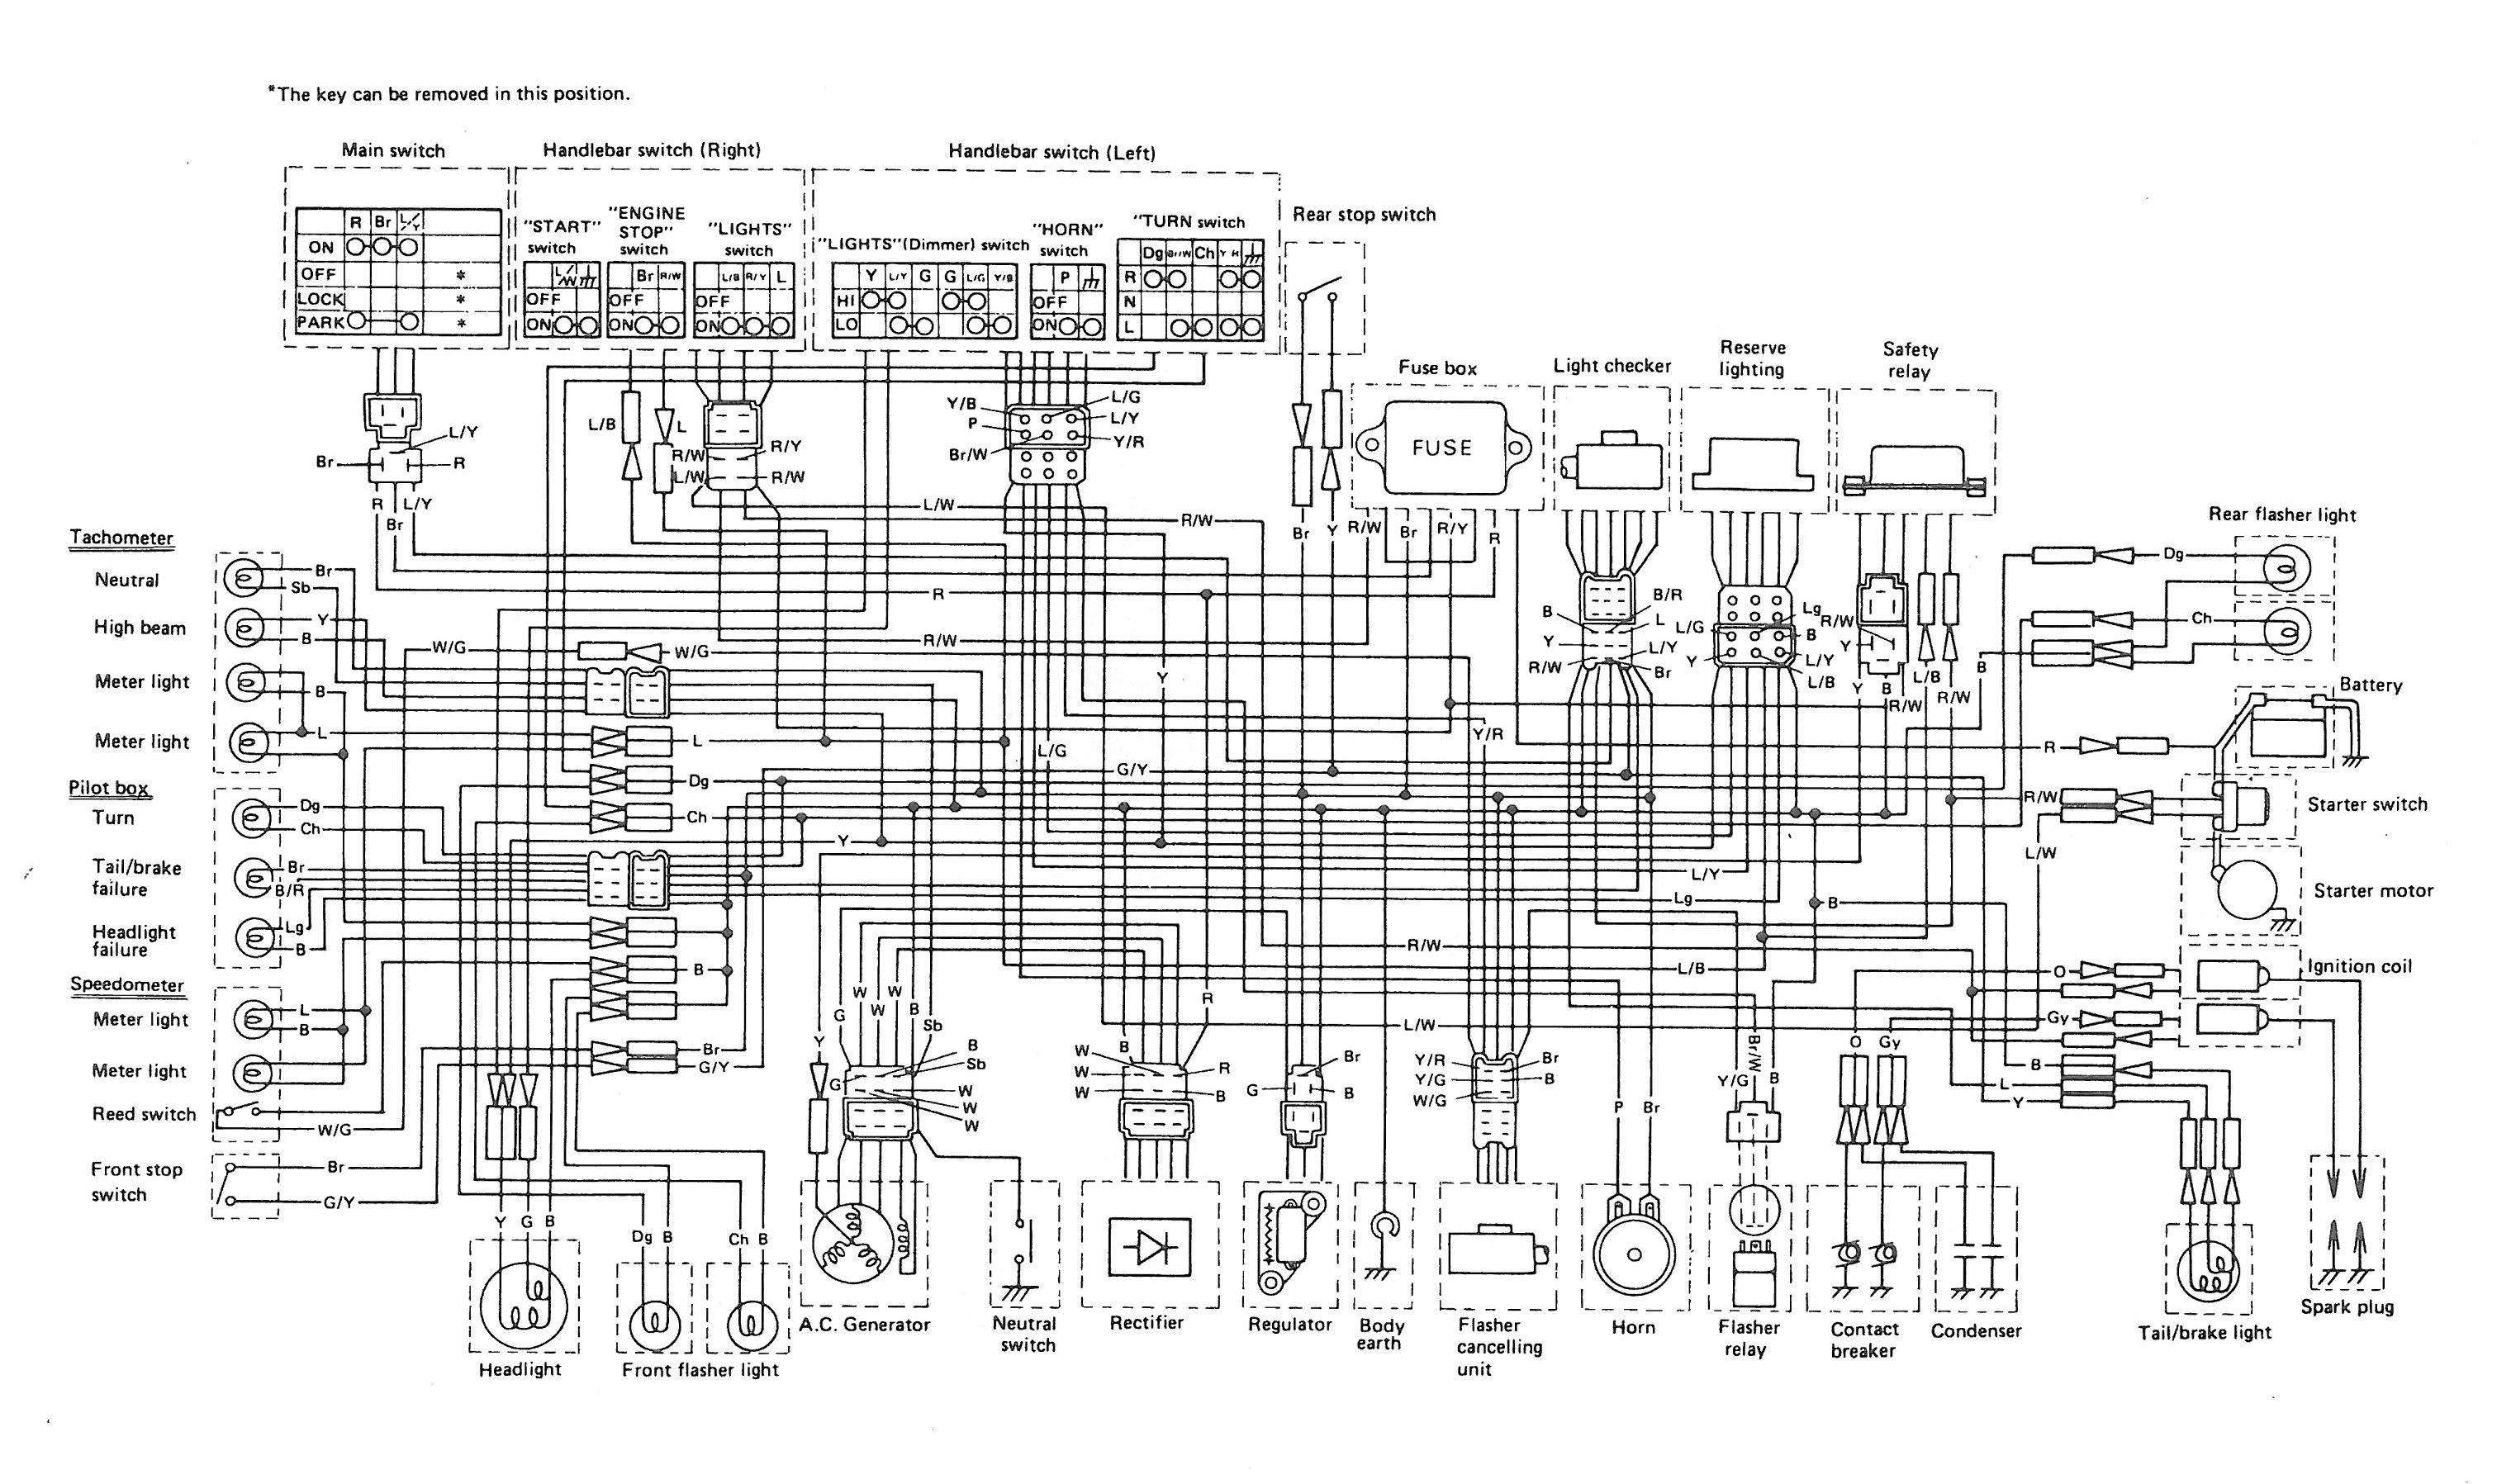 Luxury Gmdlbp Wiring Diagram Illustration - Wiring Diagram Ideas ...